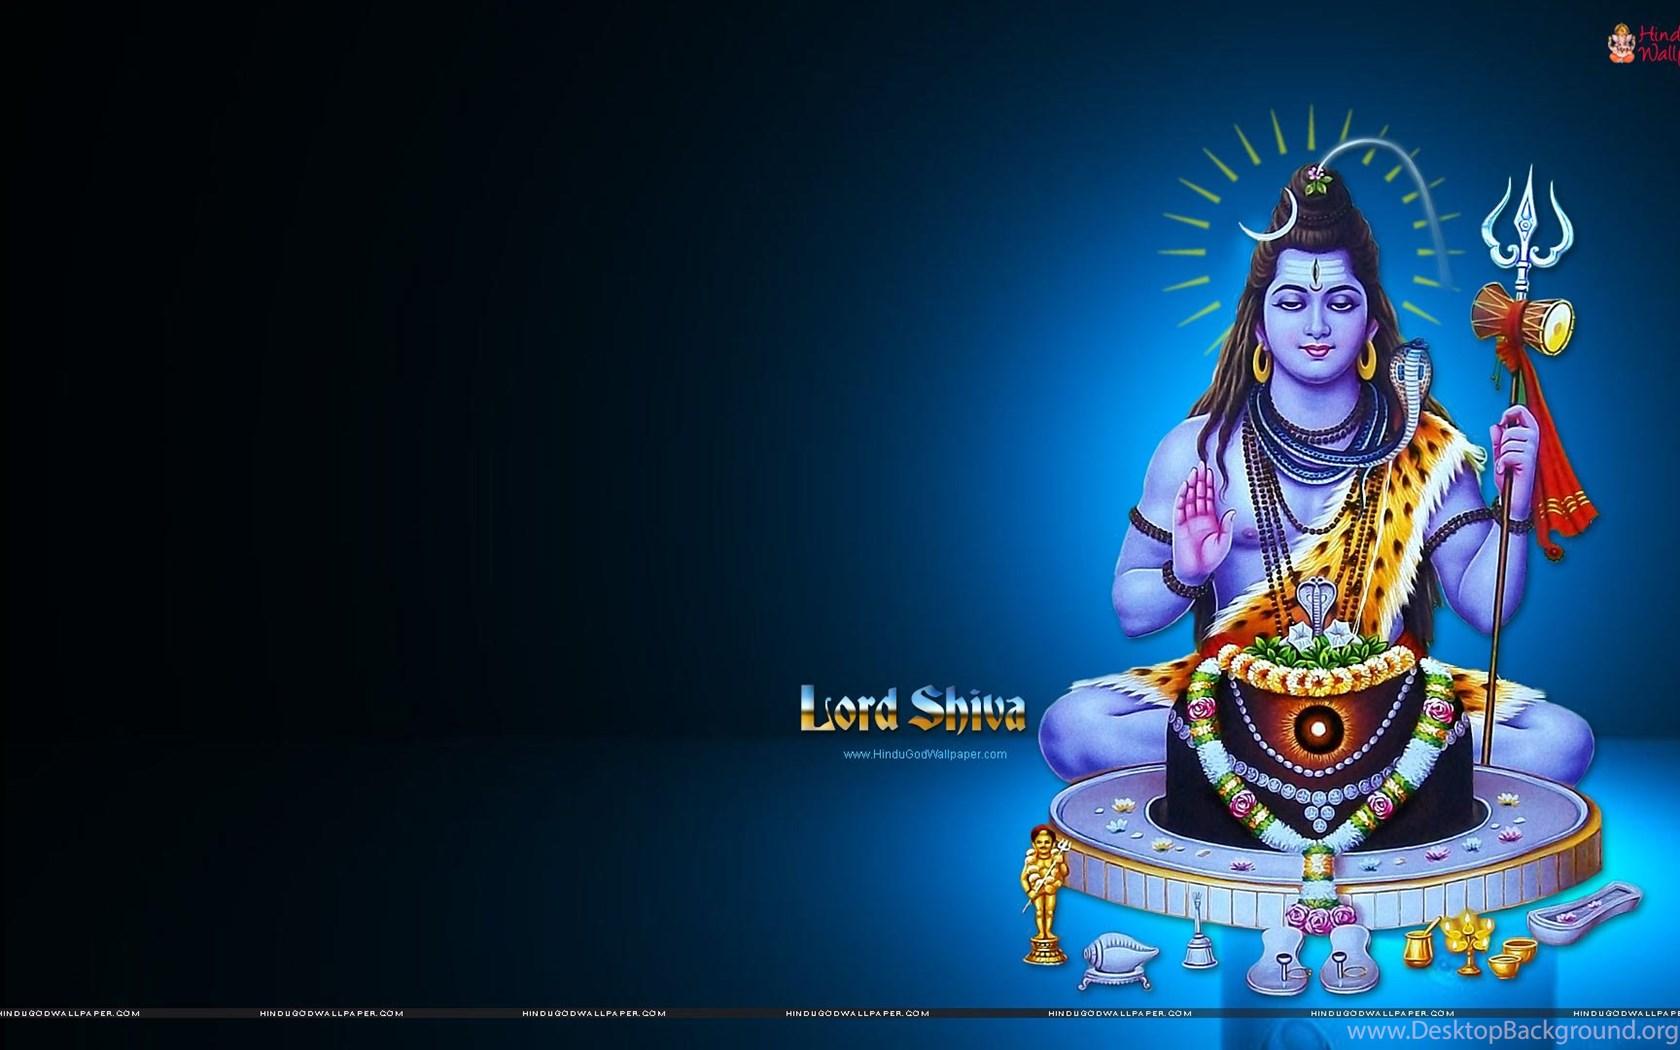 1366x768 Lord Shiva Desktop Background: Lord Shiva HD Wallpapers 1080p Download Desktop Background